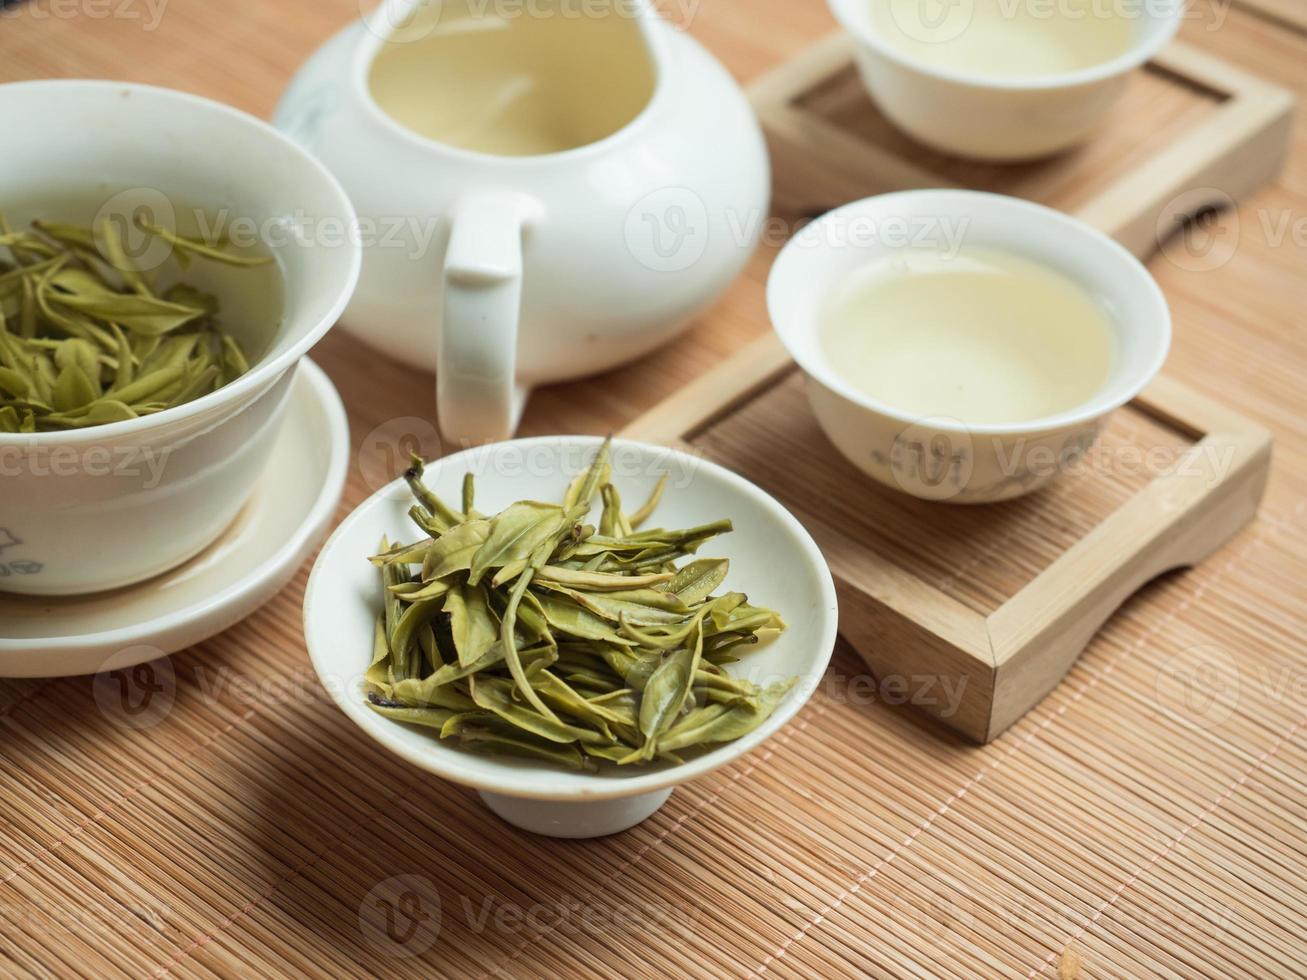 juego de té chino / juego de té verde foto